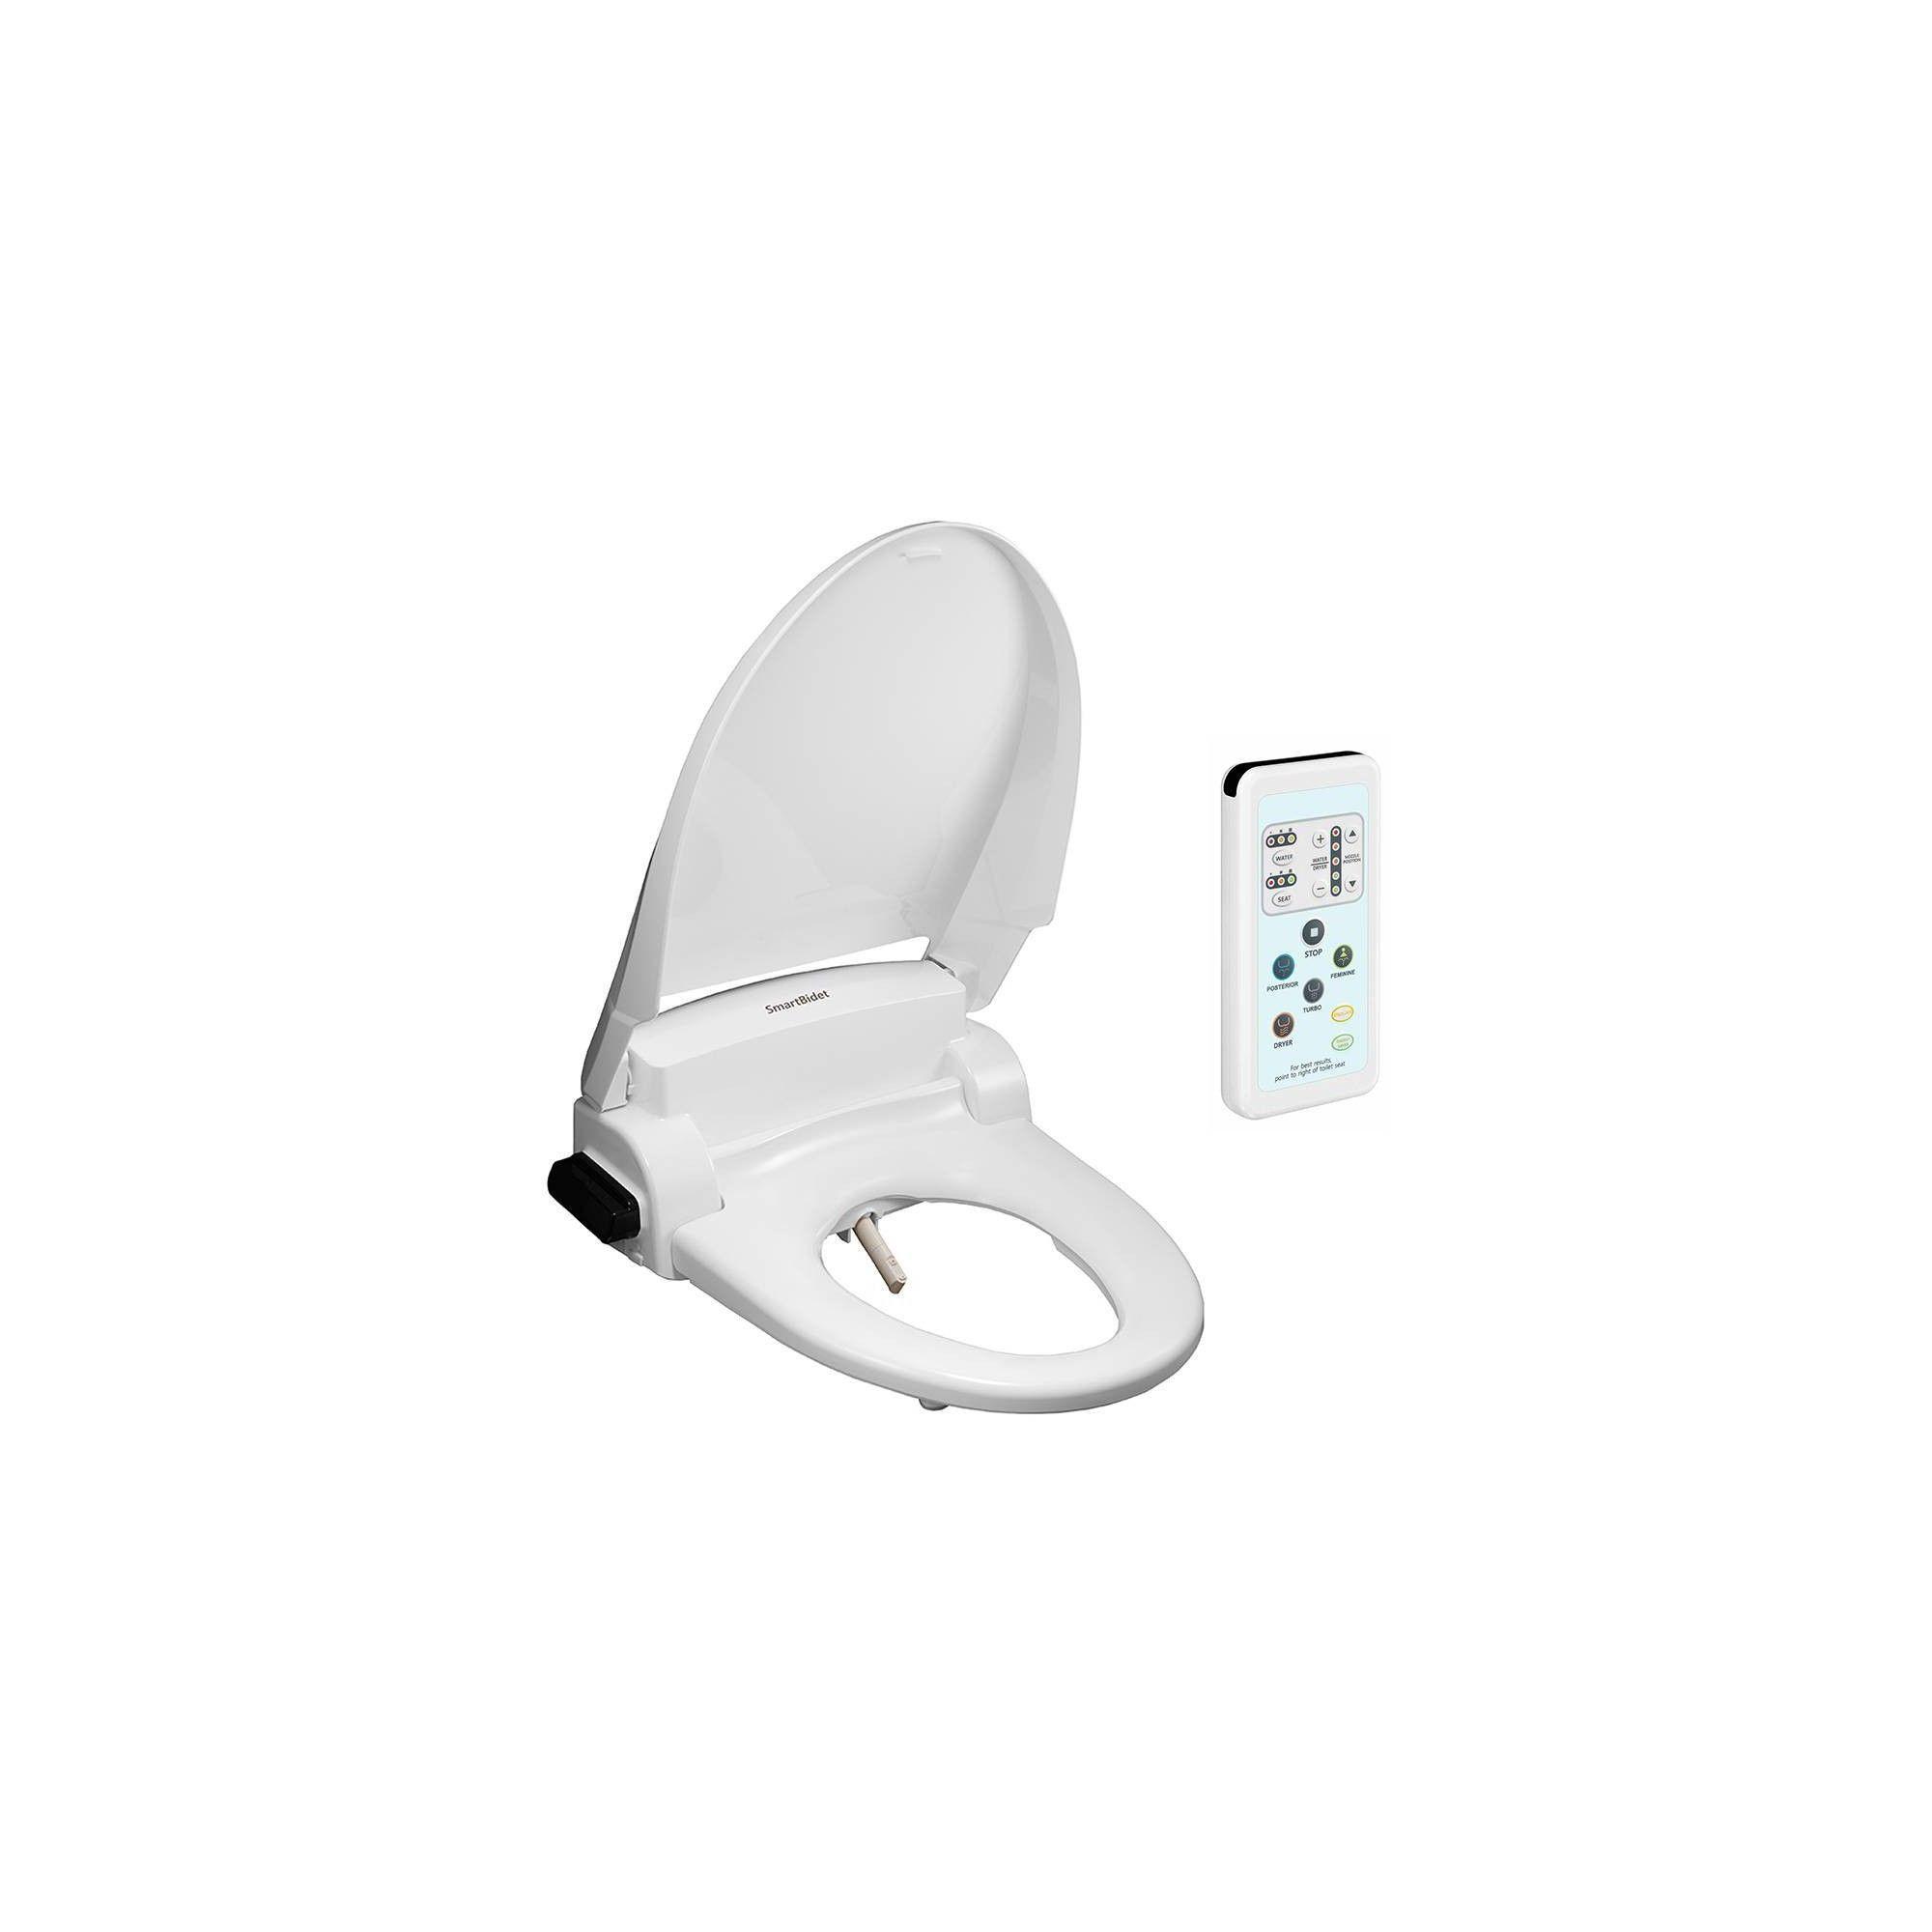 Sb 1000we Electric Bidet Toilet Seat For Elongated Toilets White